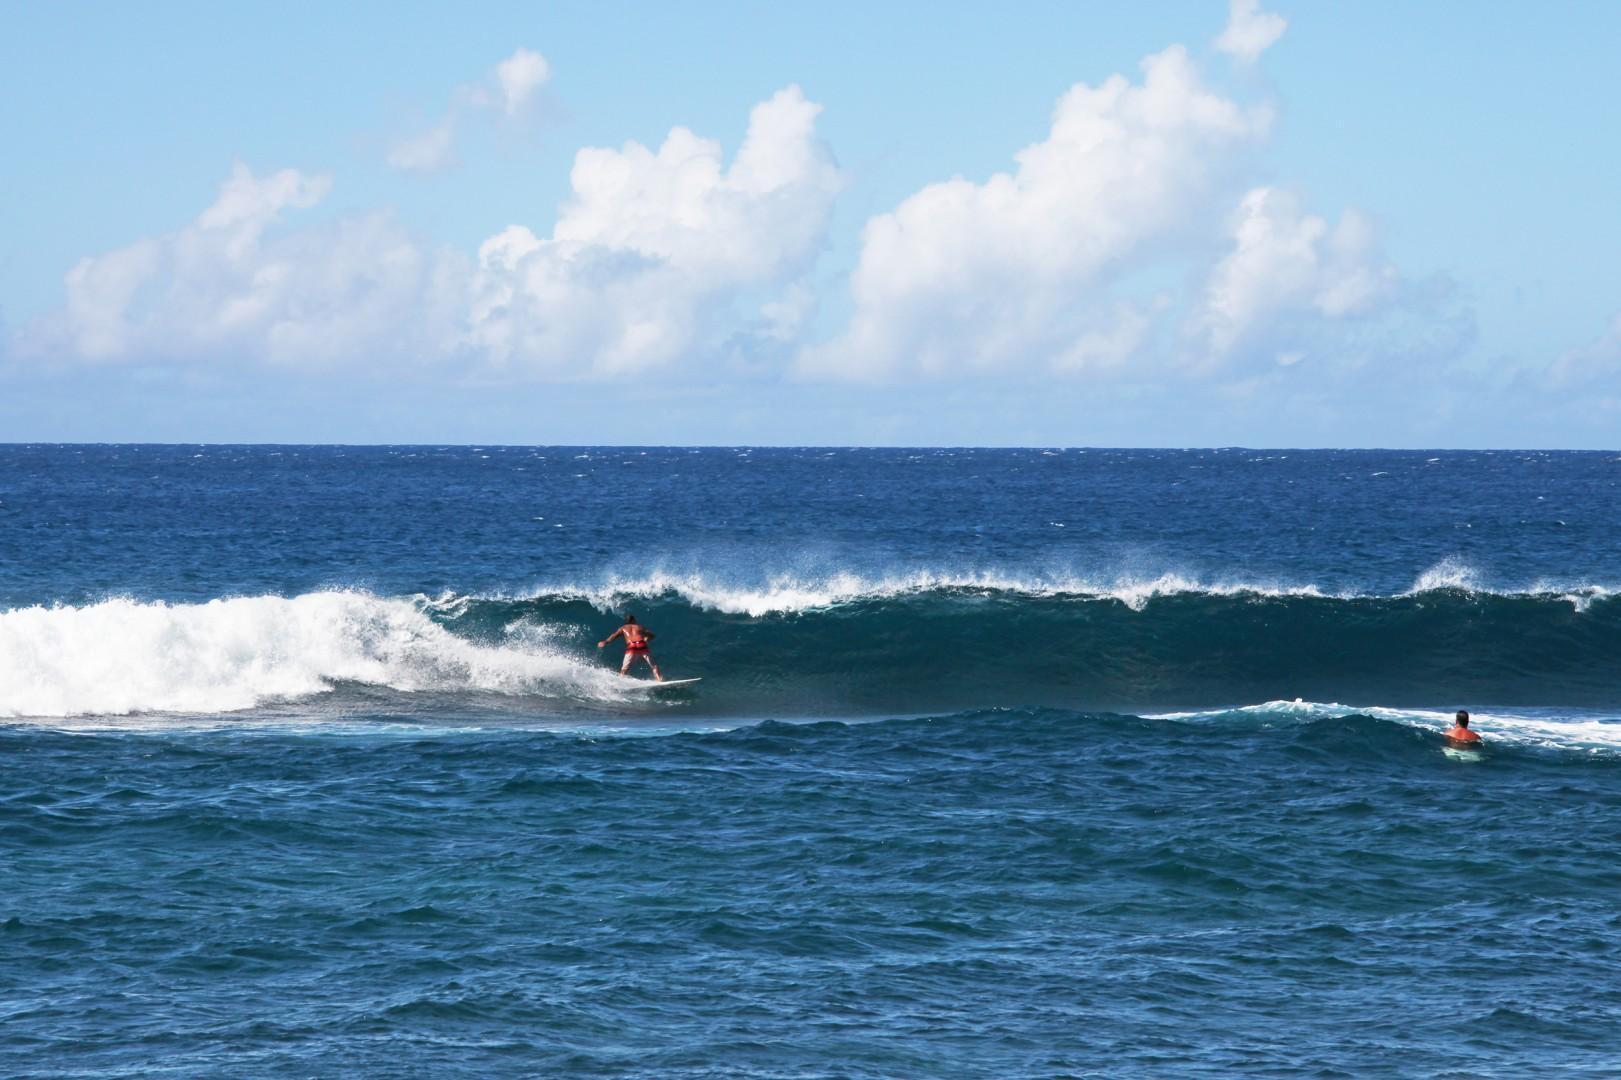 PKs surf break in Poipu